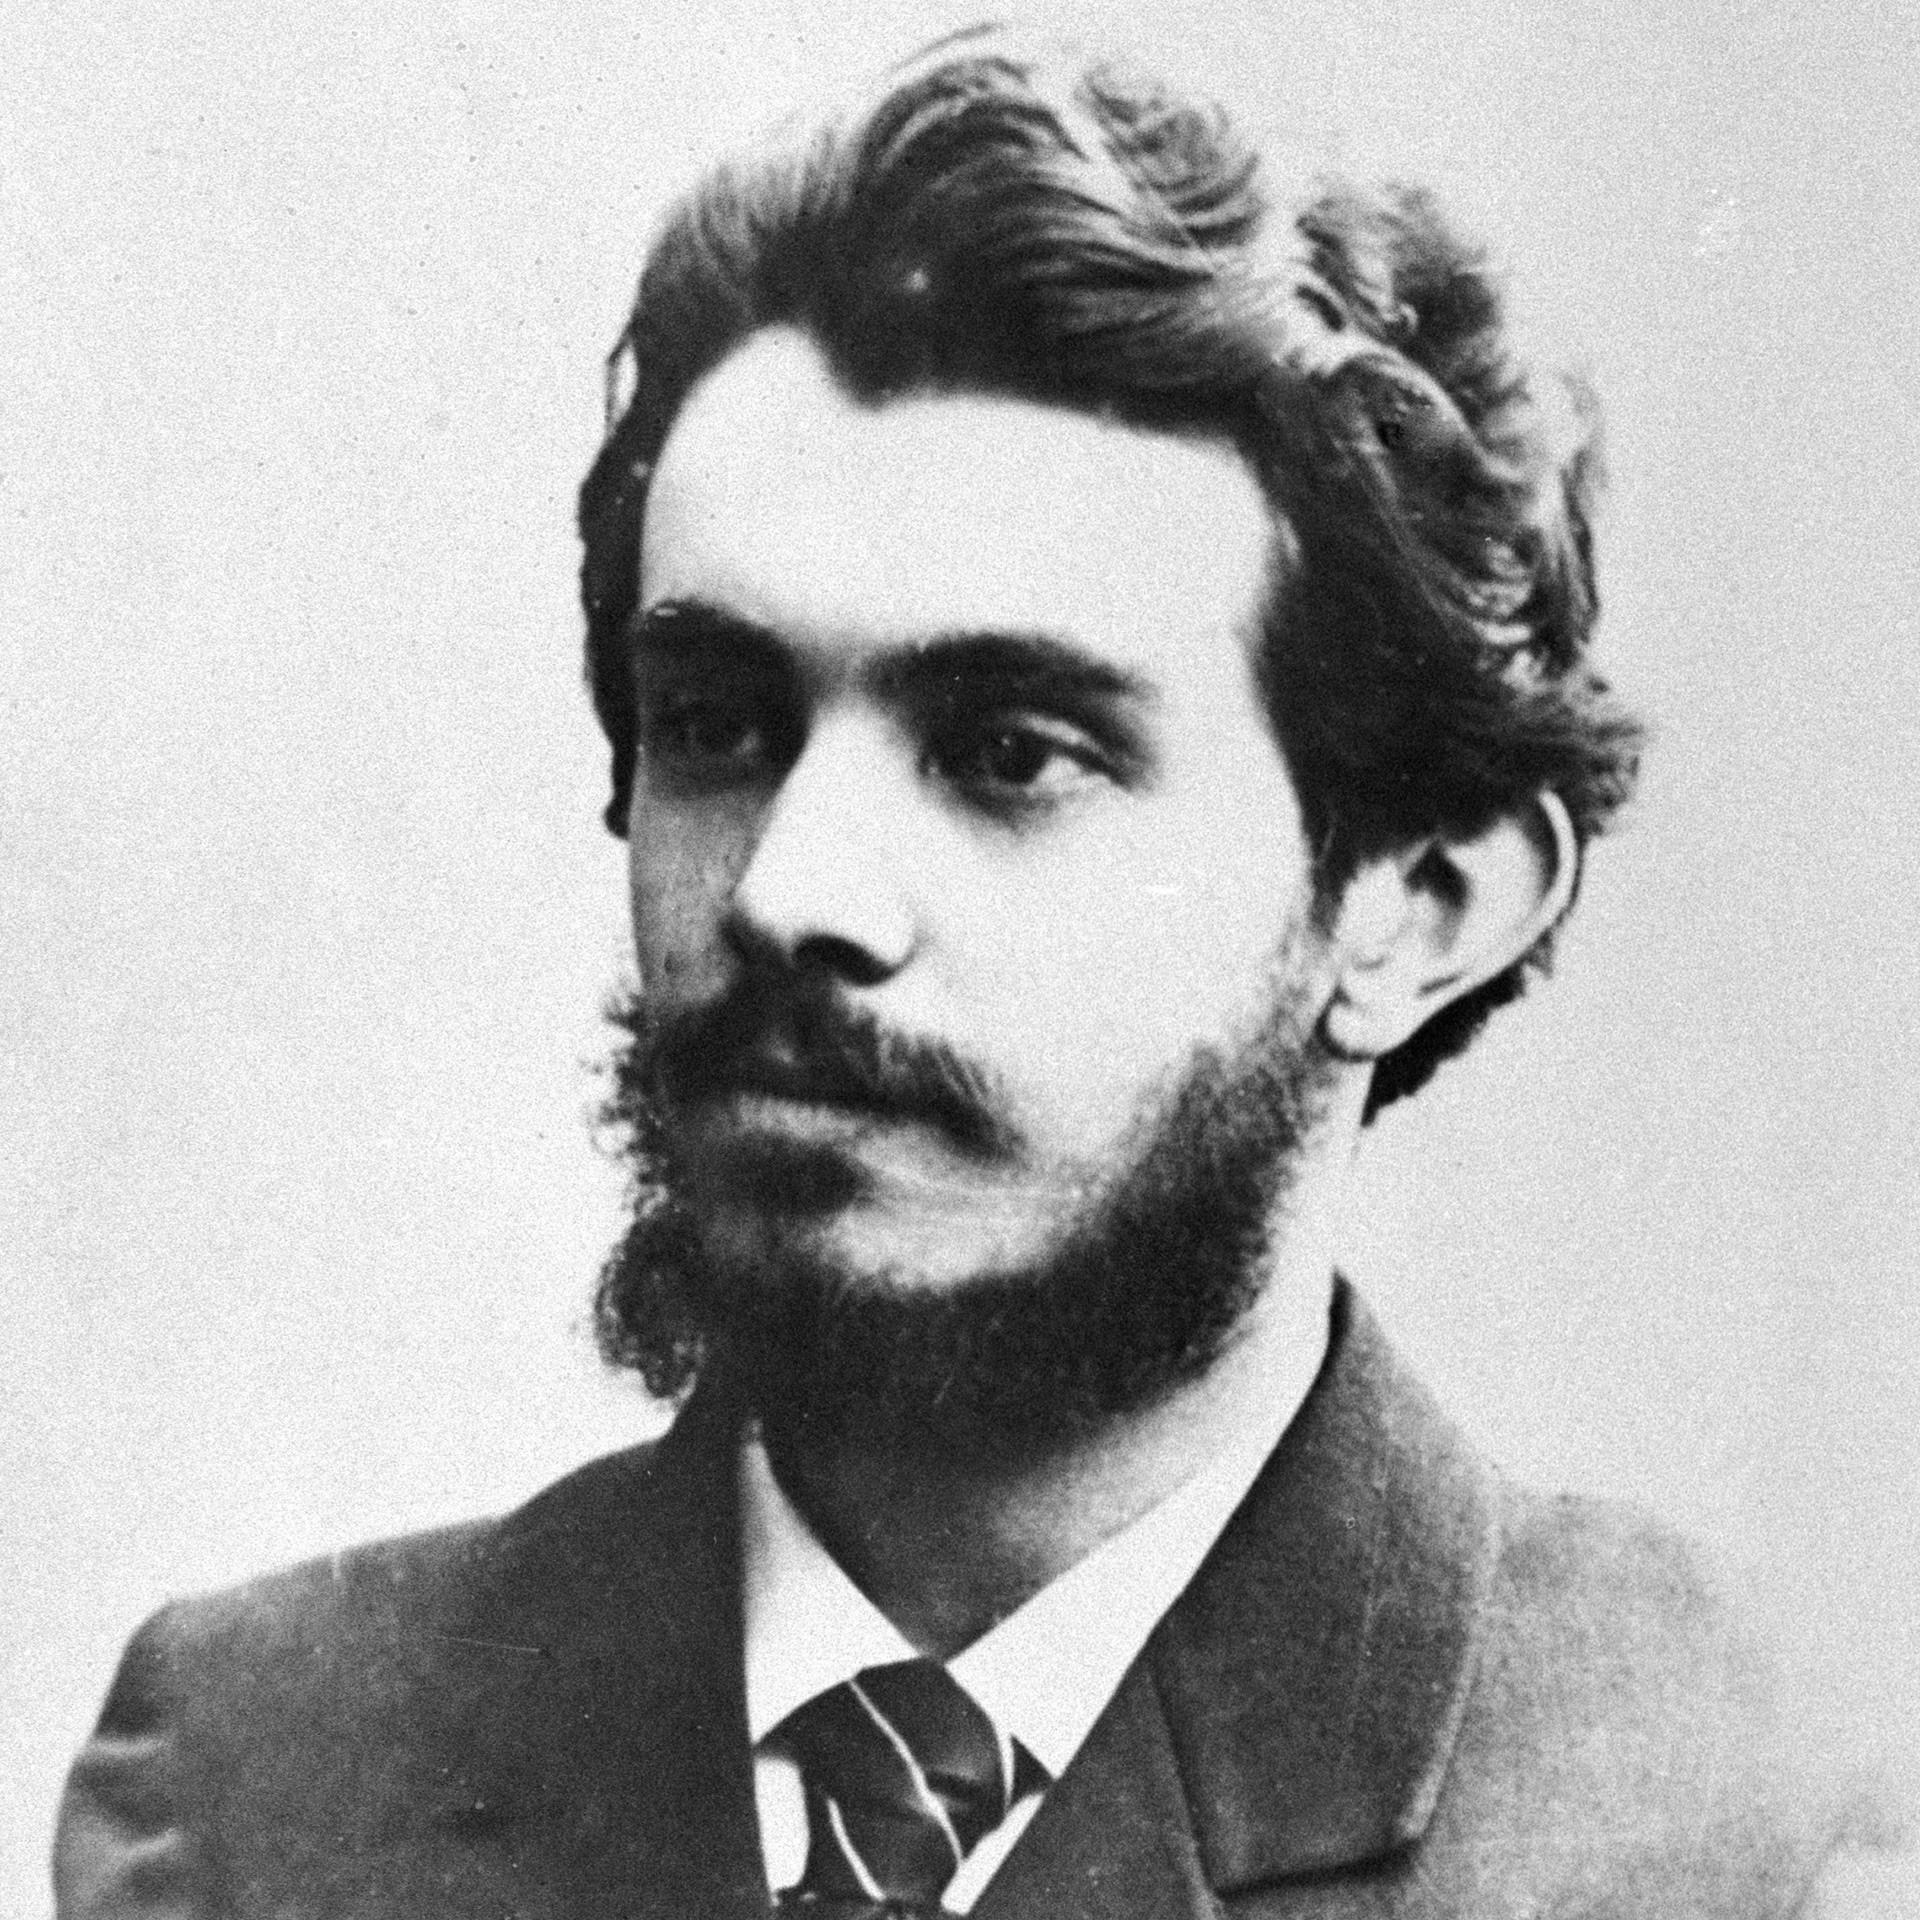 Nikola Berdjajew